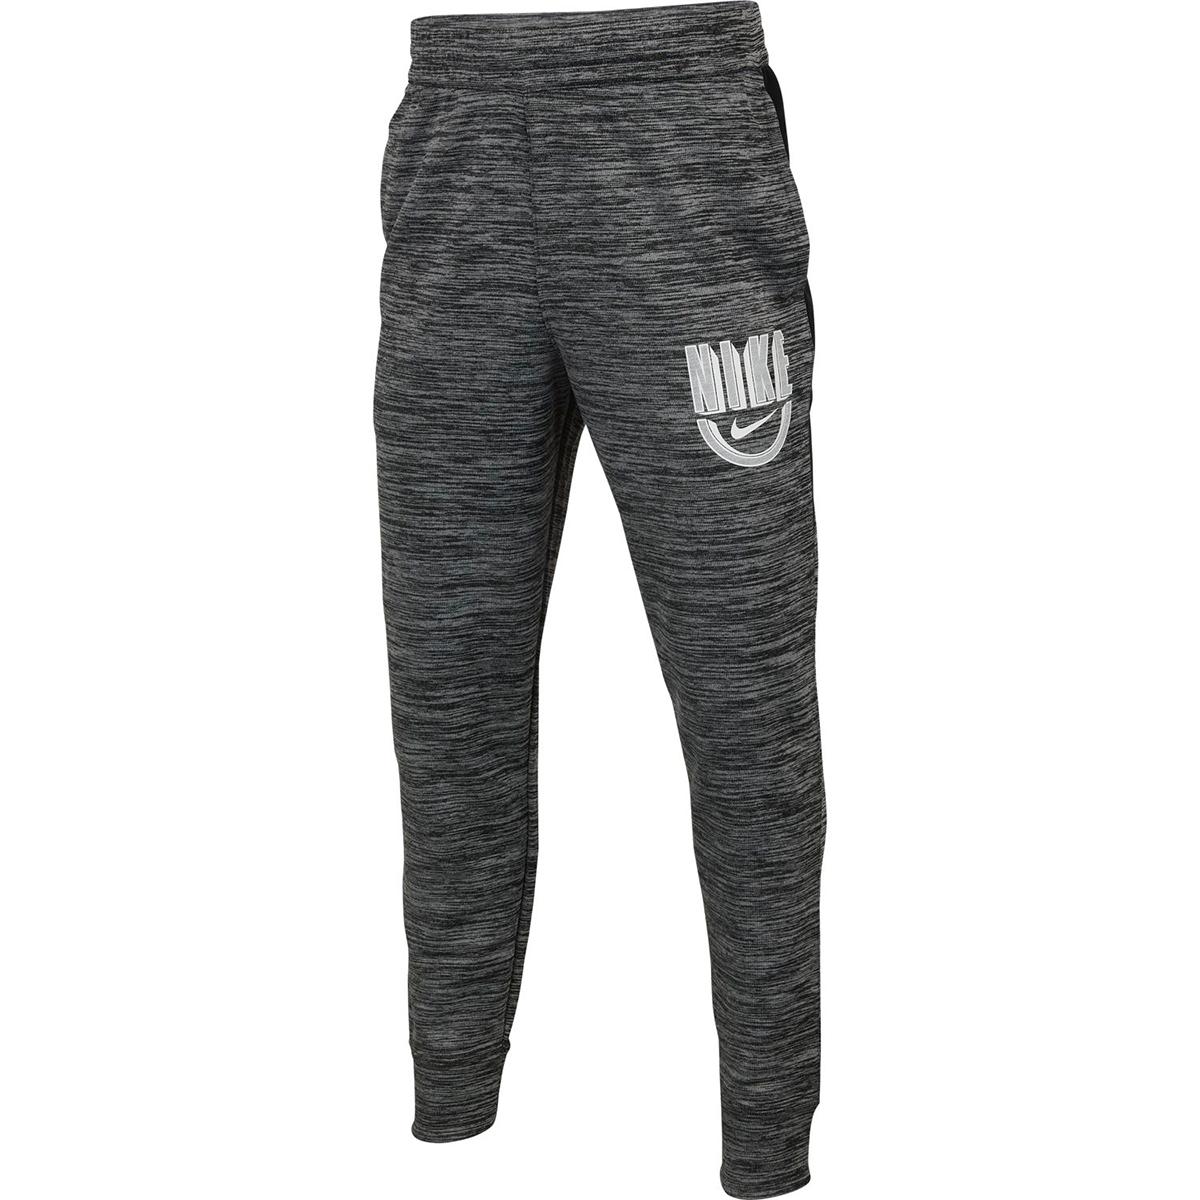 Nike Boys' Spotlight Basketball Pants - Black, S